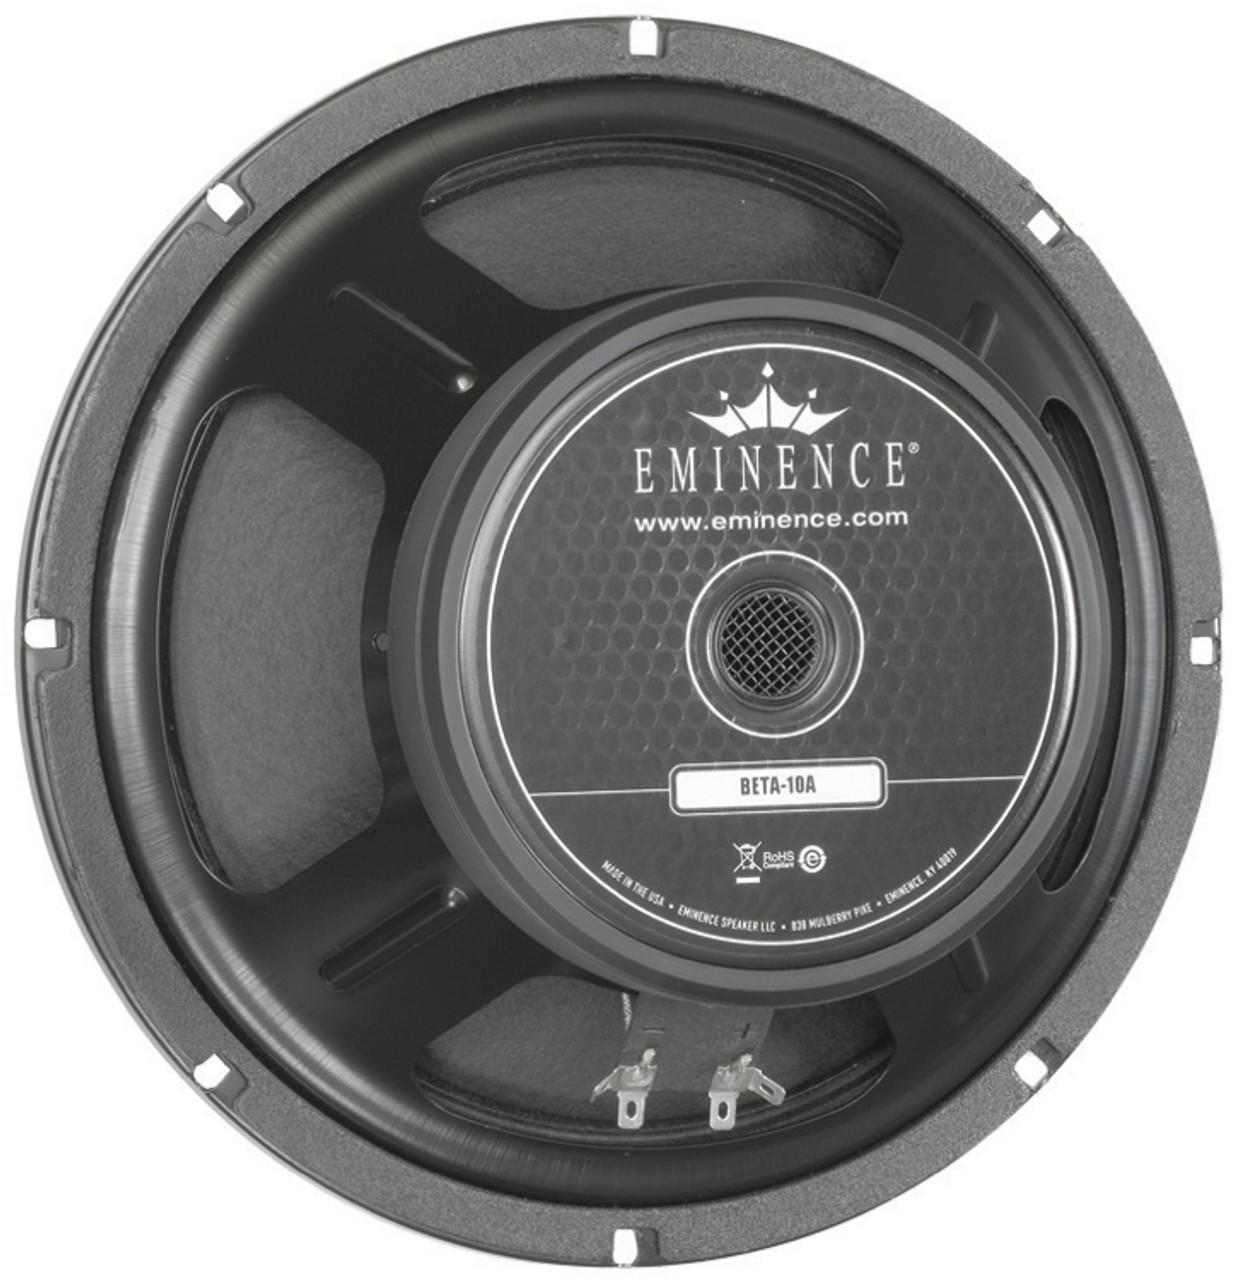 Eminence Beta-10A